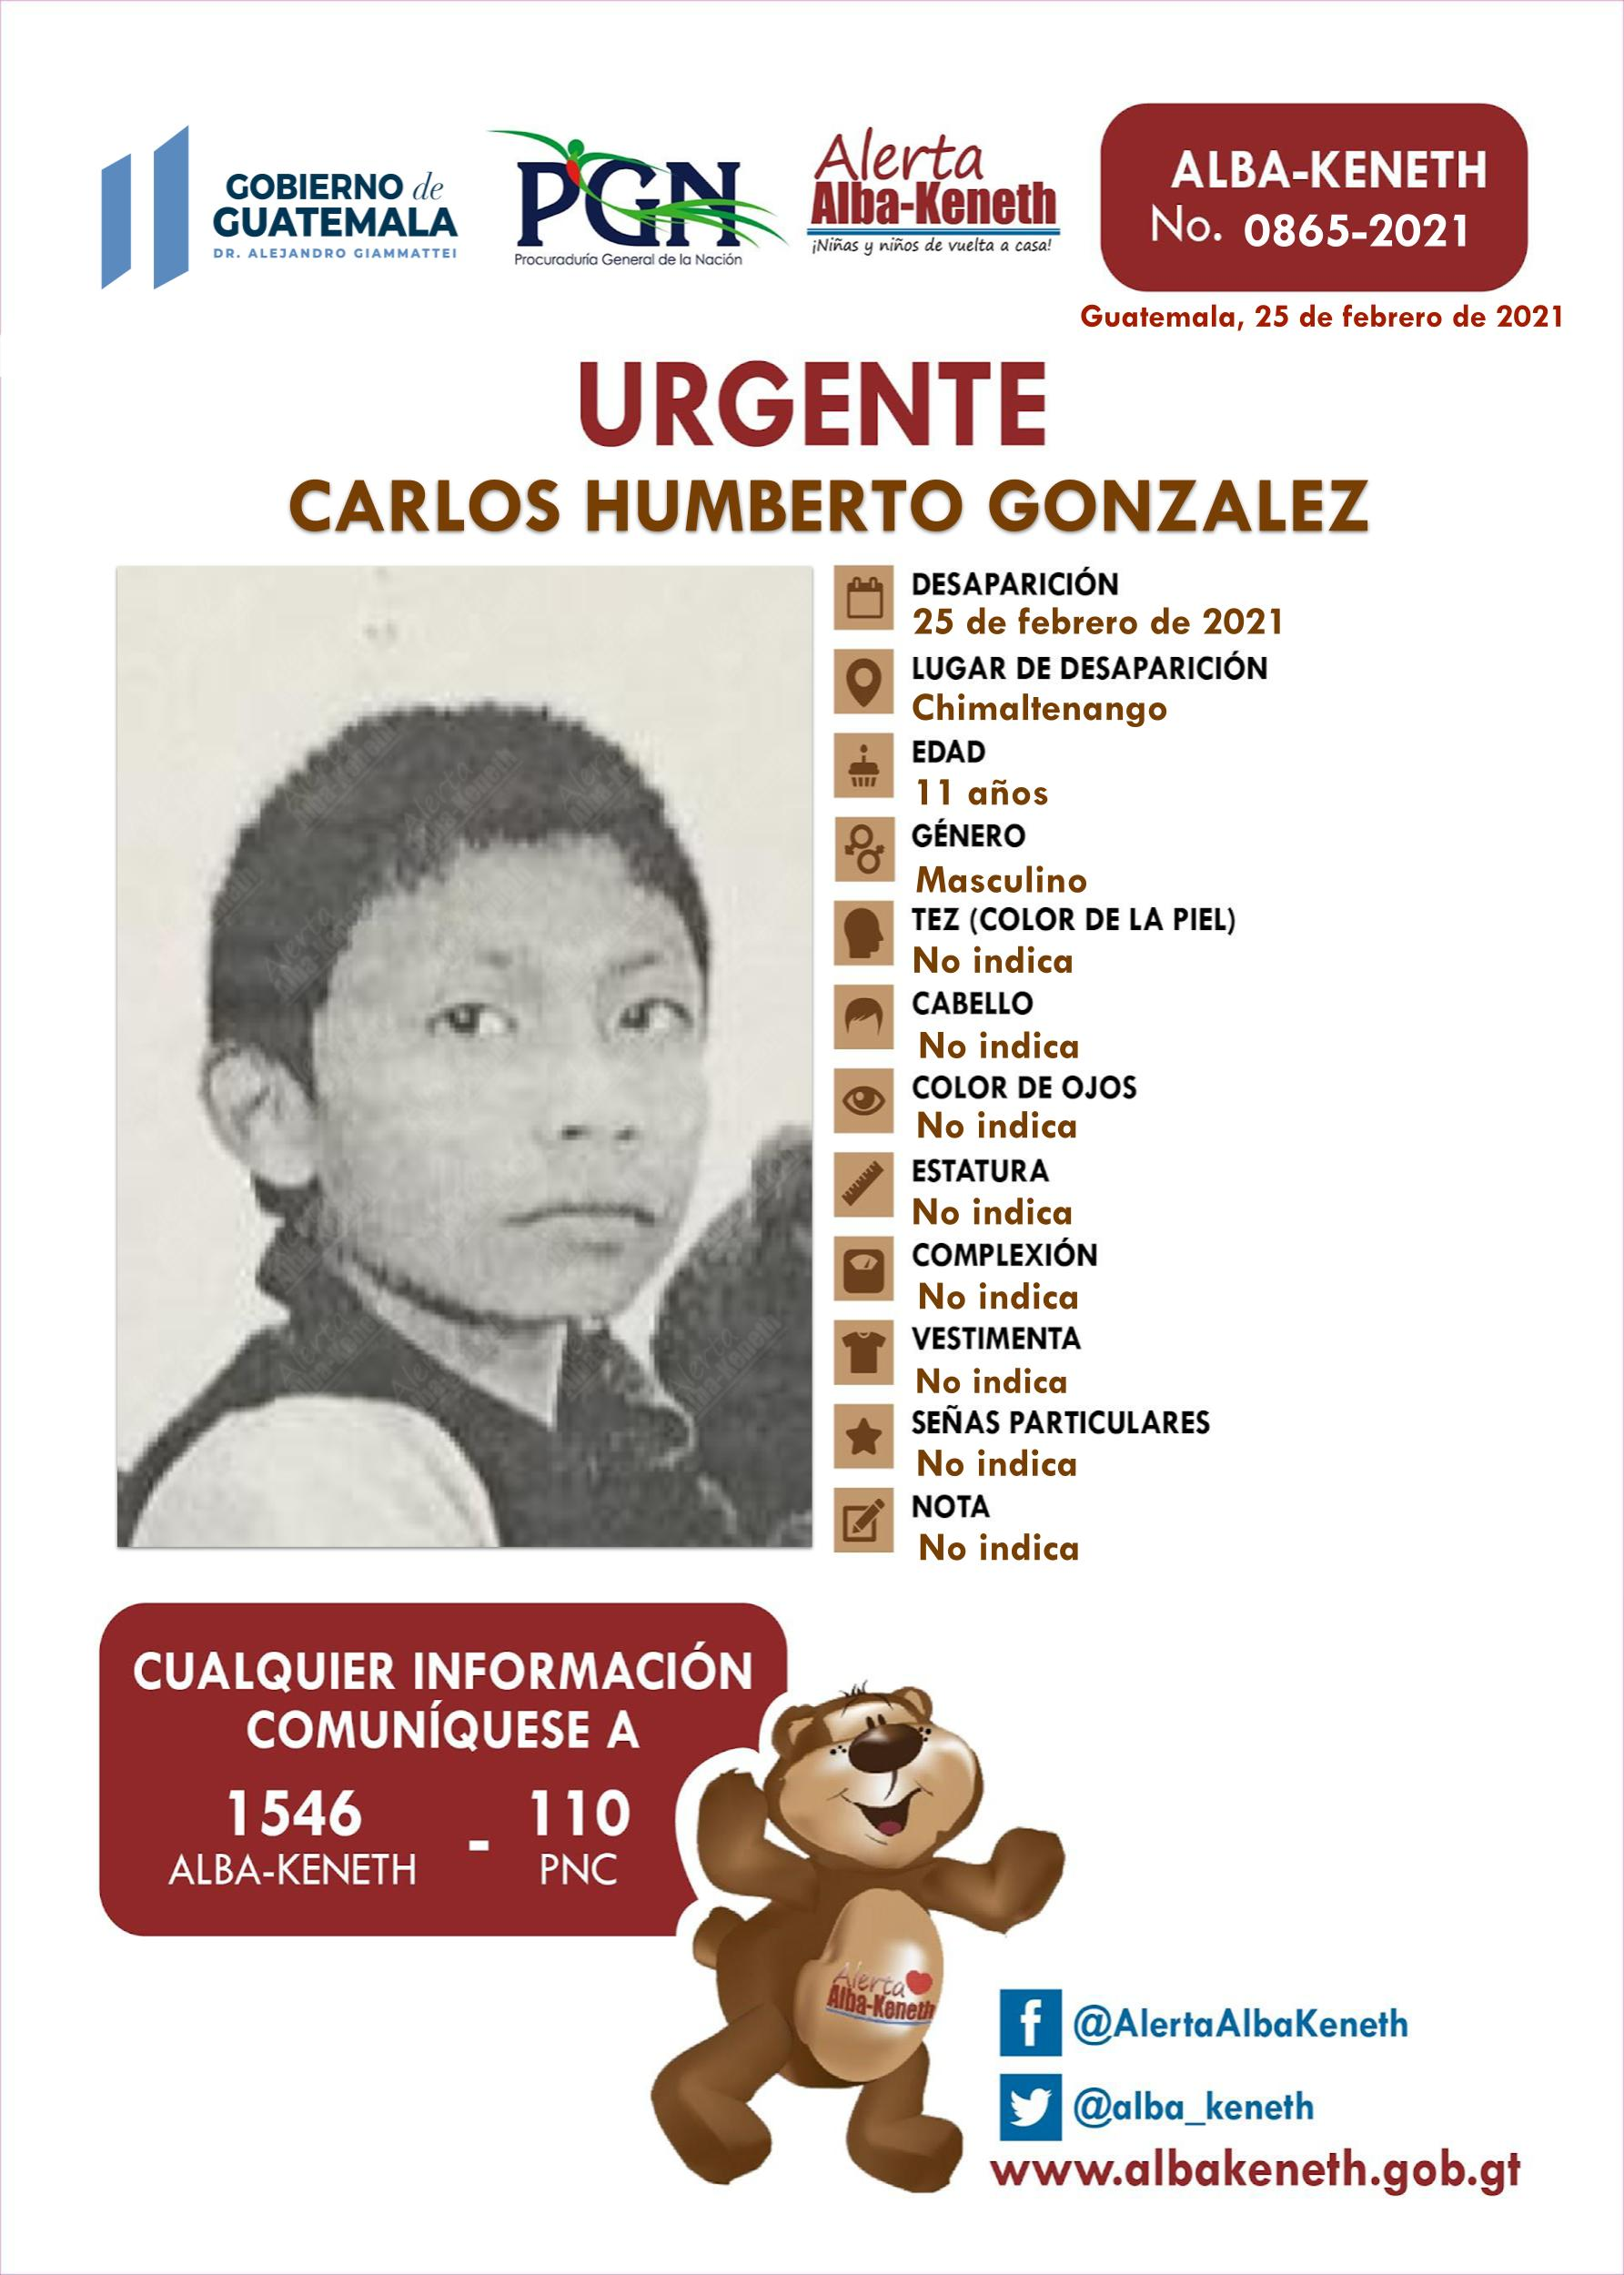 Carlos Humberto Gonzalez